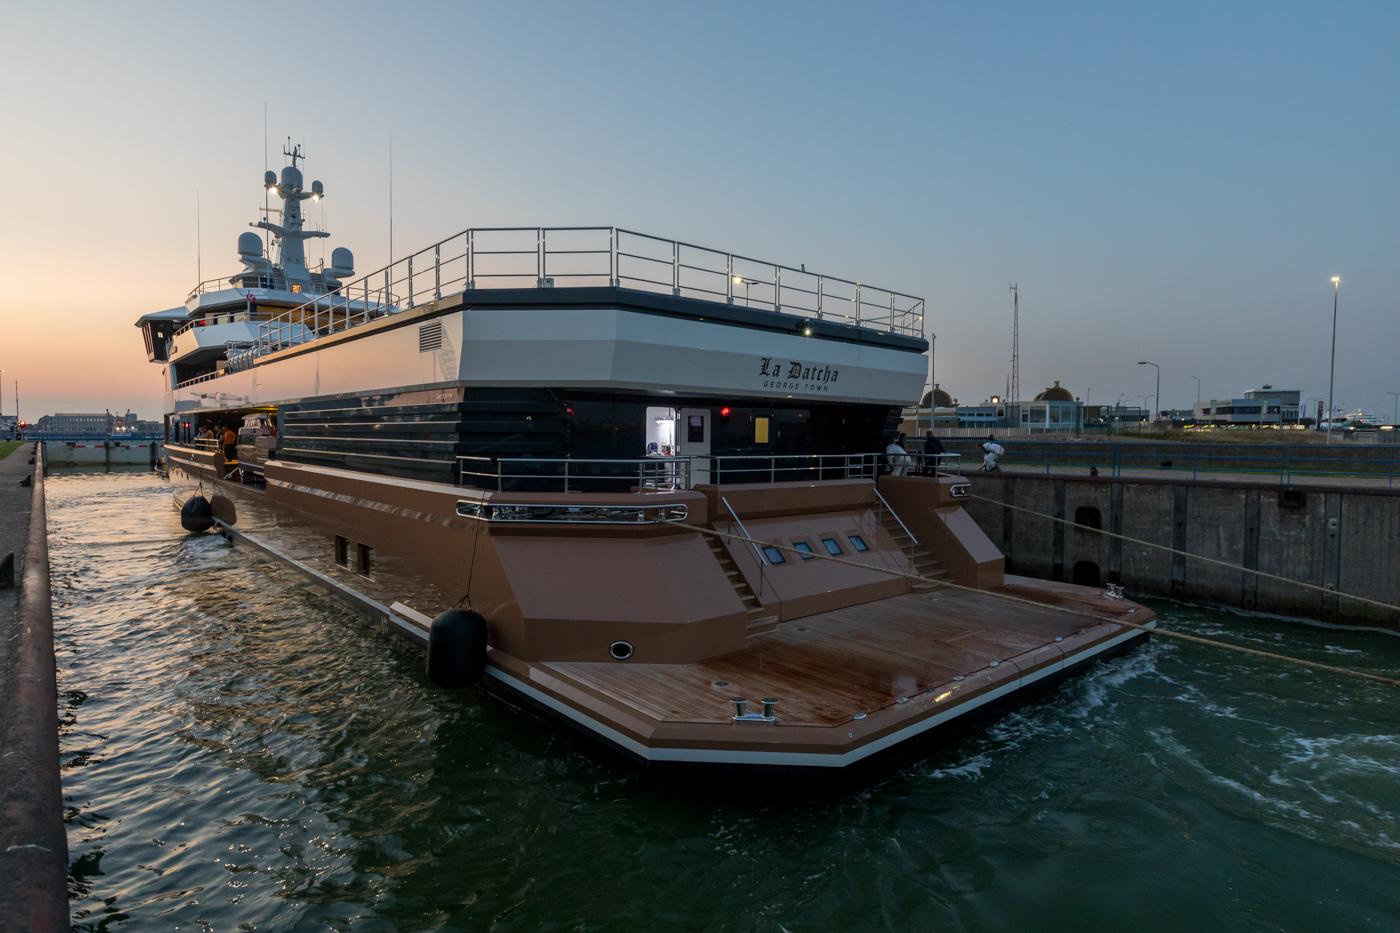 Yacht-La-Datcha-77-Heliski-Russia-8